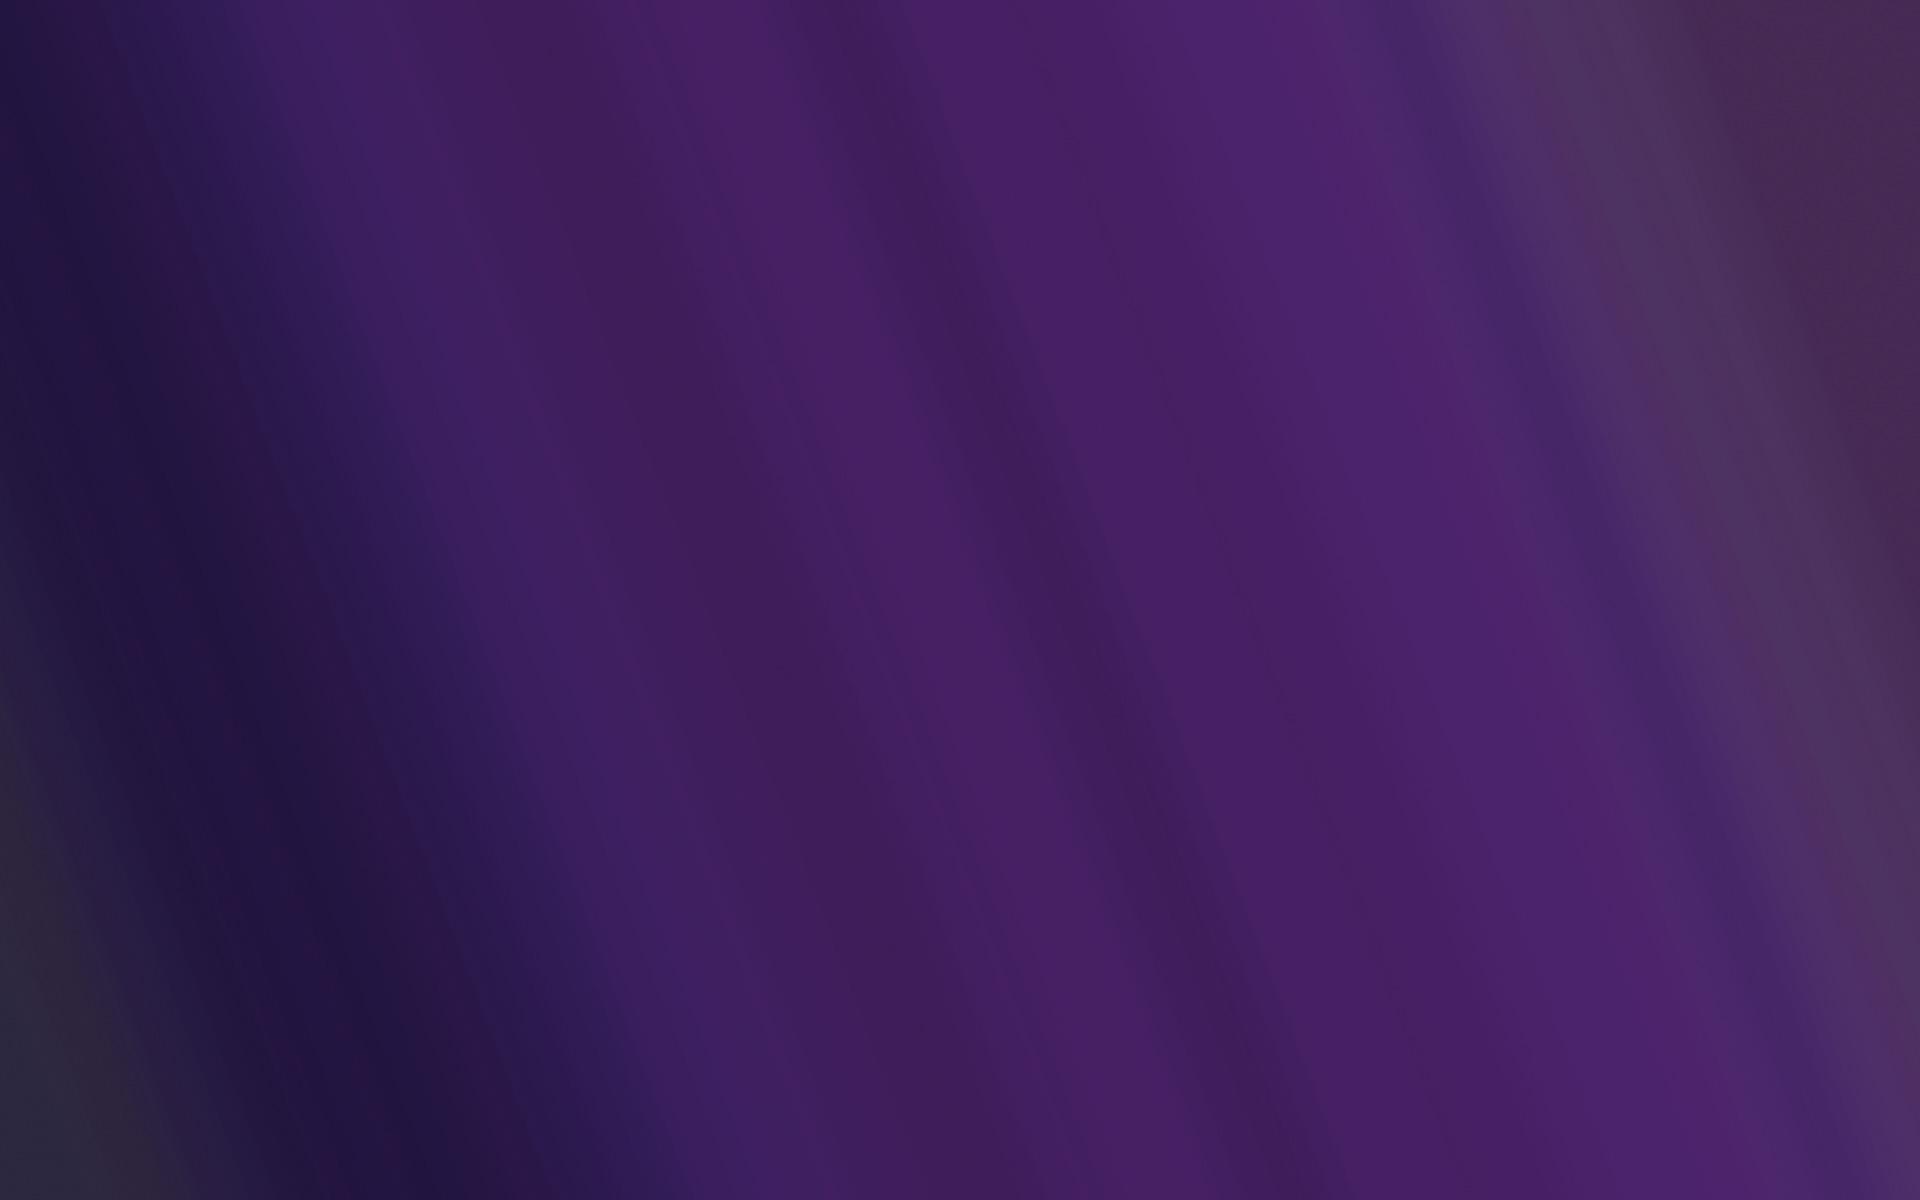 Purple Gradient Background Wallpaper Image Rosemary Thomas 1920x1200